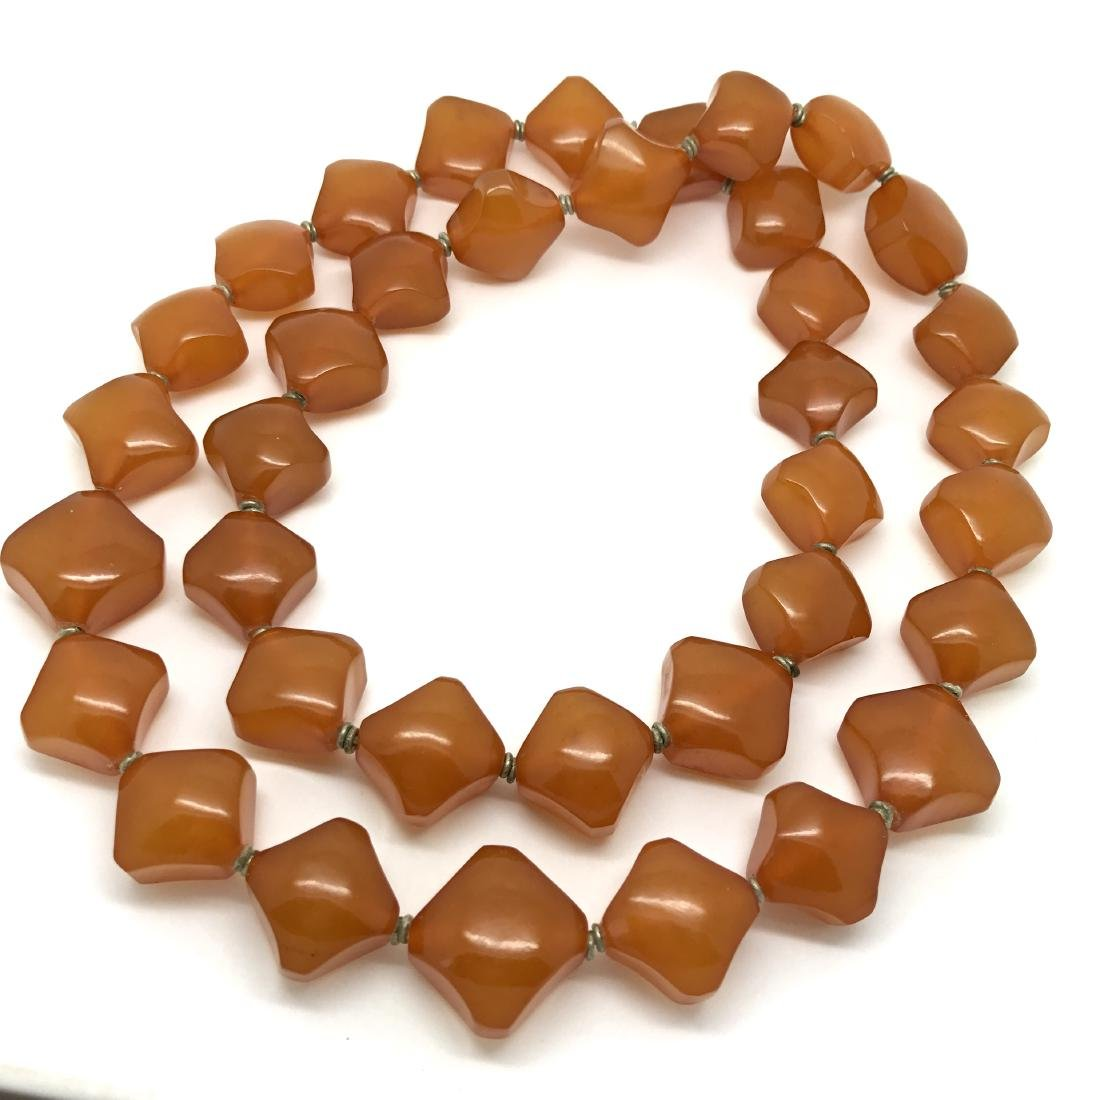 Old Baltic Amber Vintage Necklace Butterscotch Cognac - 2